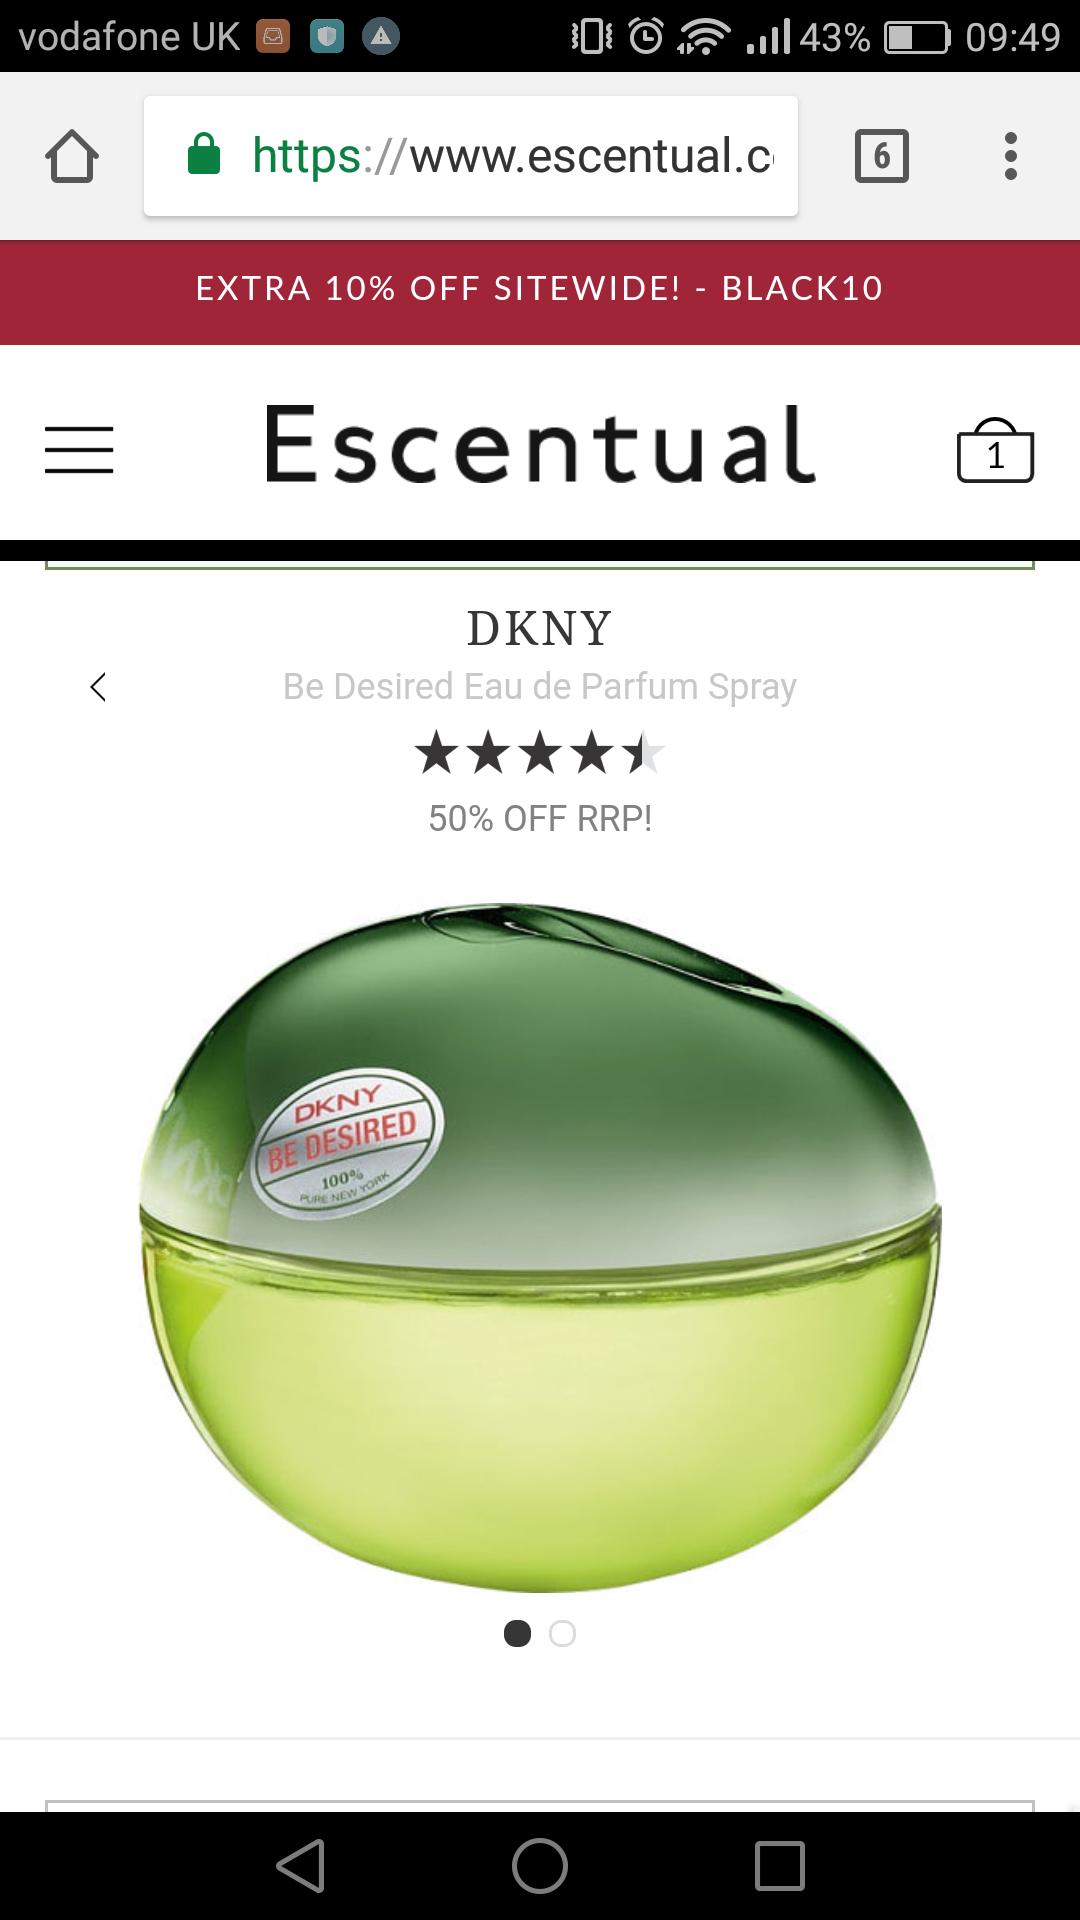 DKNY 100ml edp at Escentual